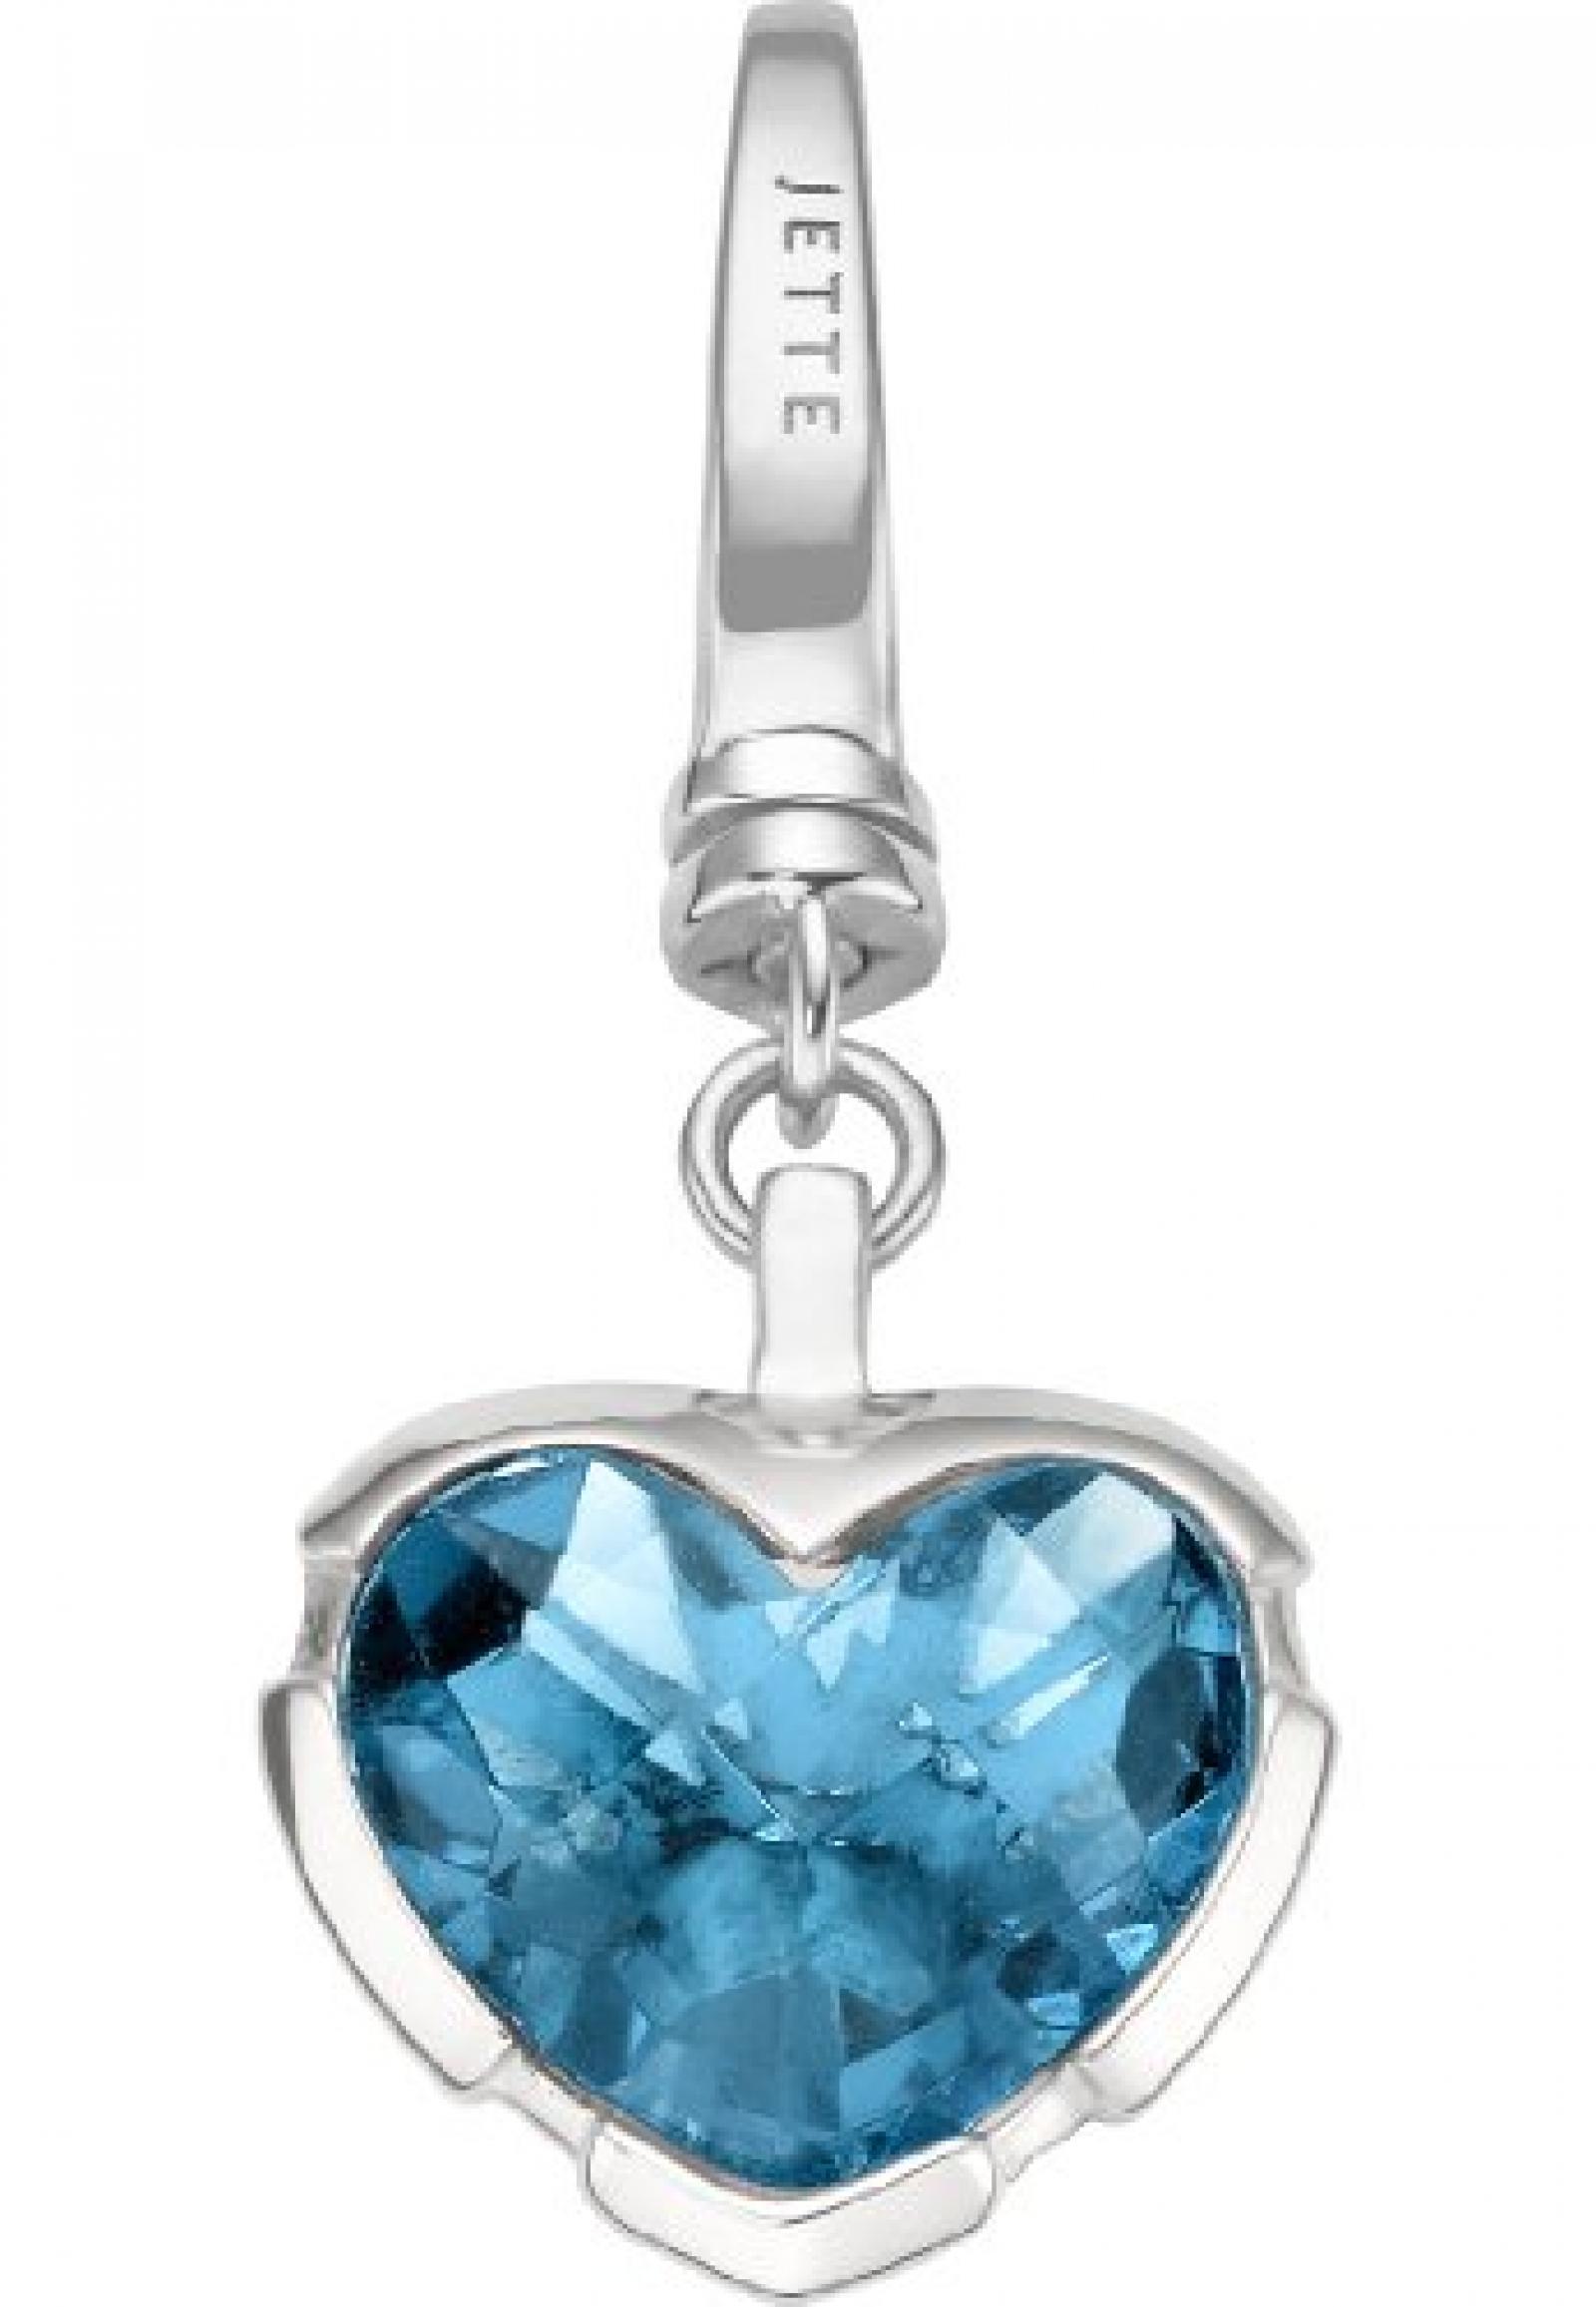 JETTE Charms Damen-Charm CHARM 925er Silber rhodiniert 1 Kristall One Size, blau